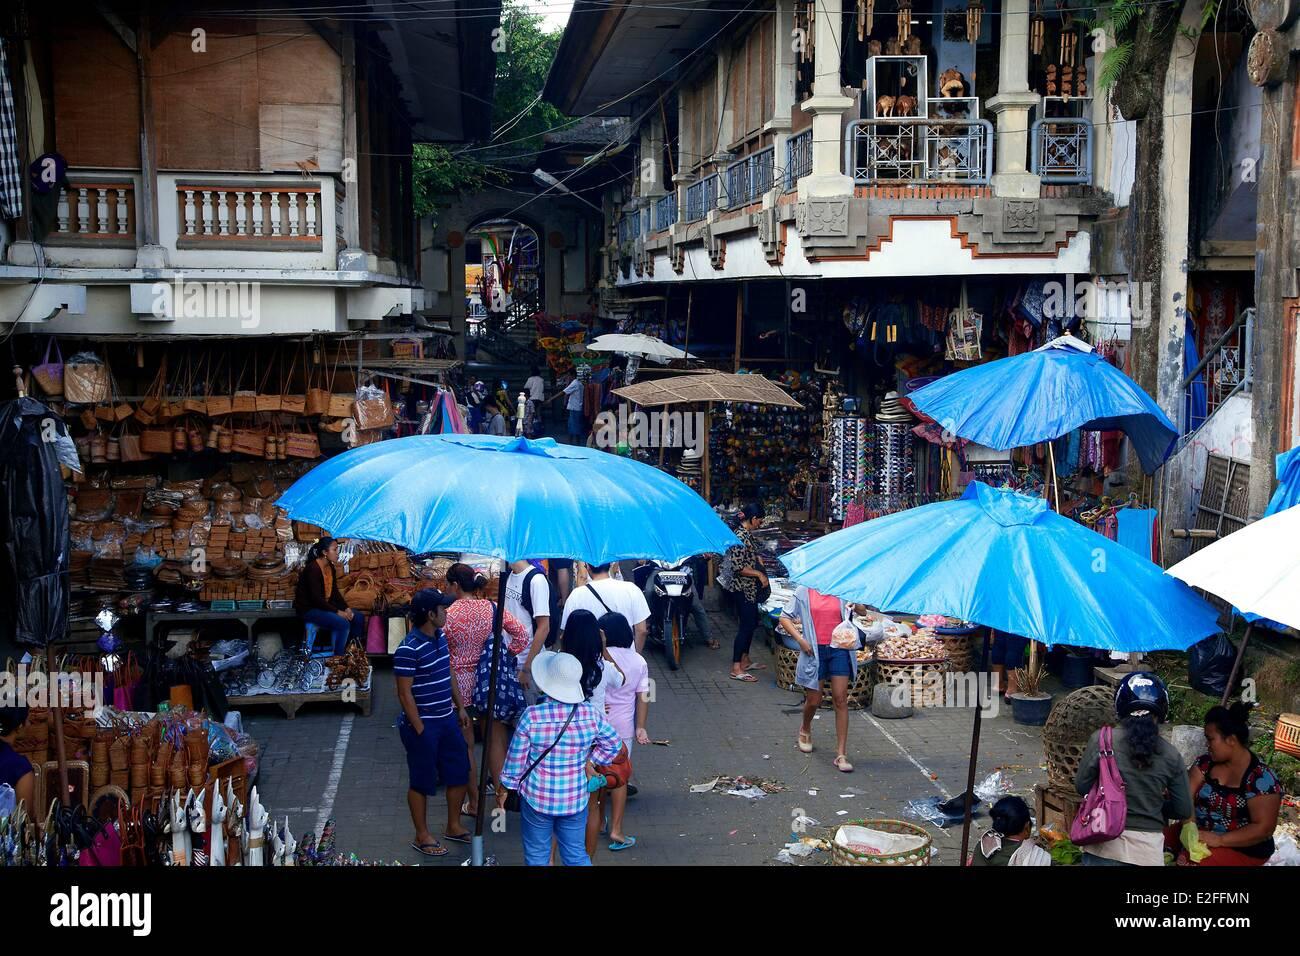 L'INDONÉSIE, Bali, Ubud, Pasar Seni, le marché artisanal Photo Stock